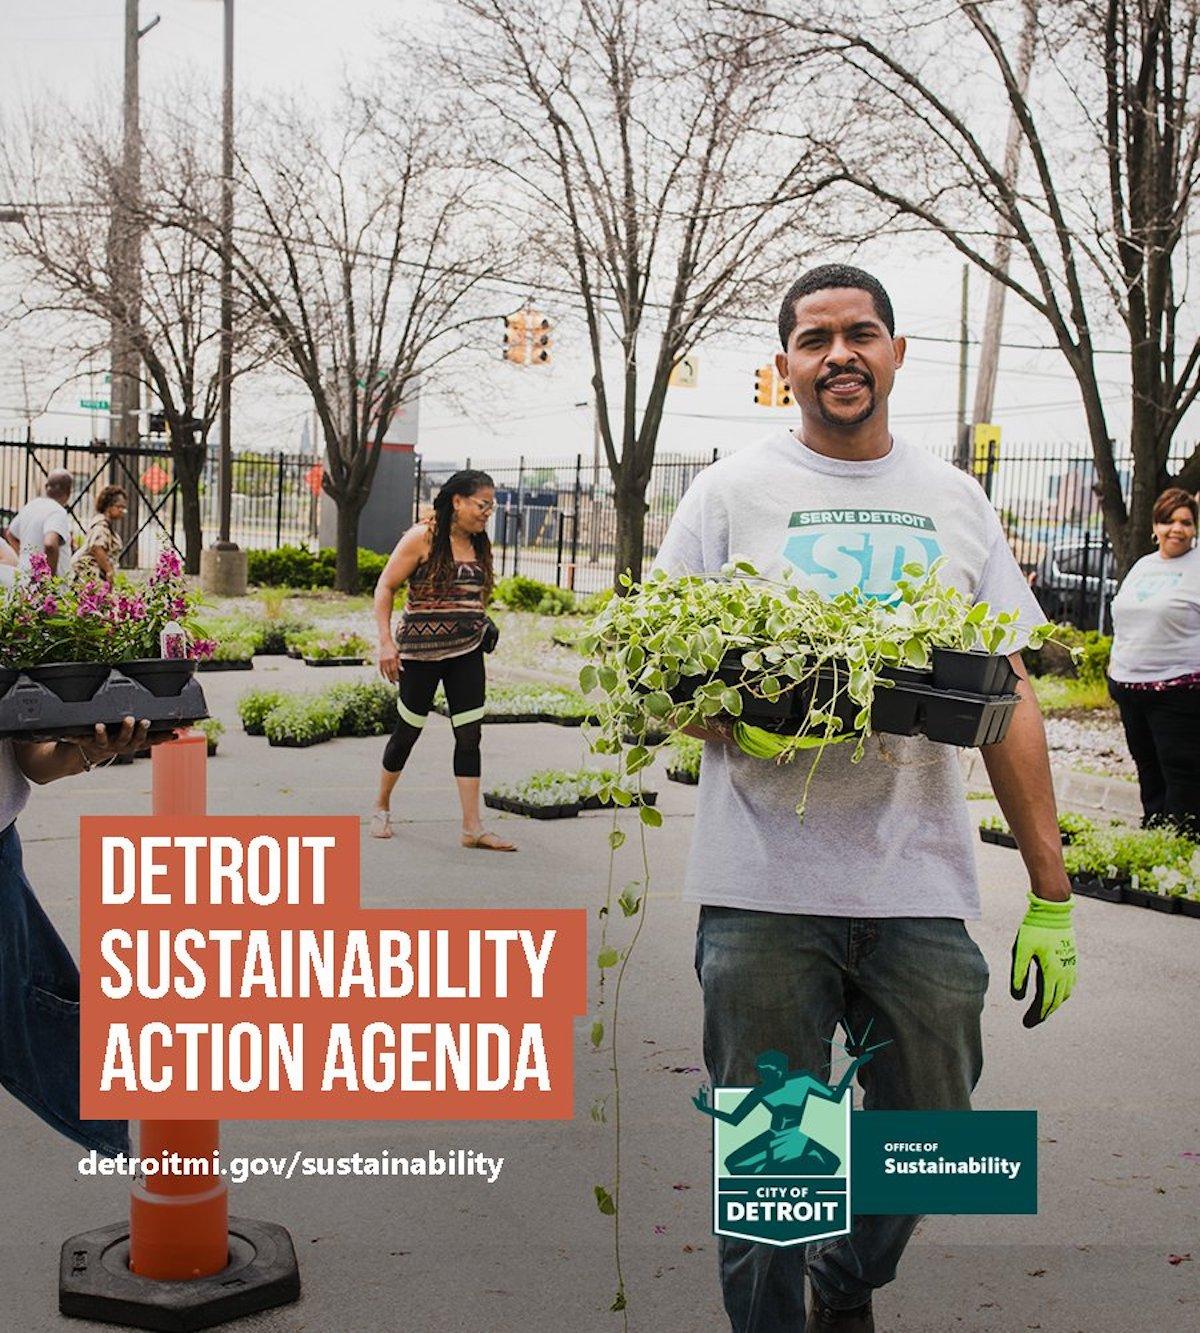 Detroit Action Agenda